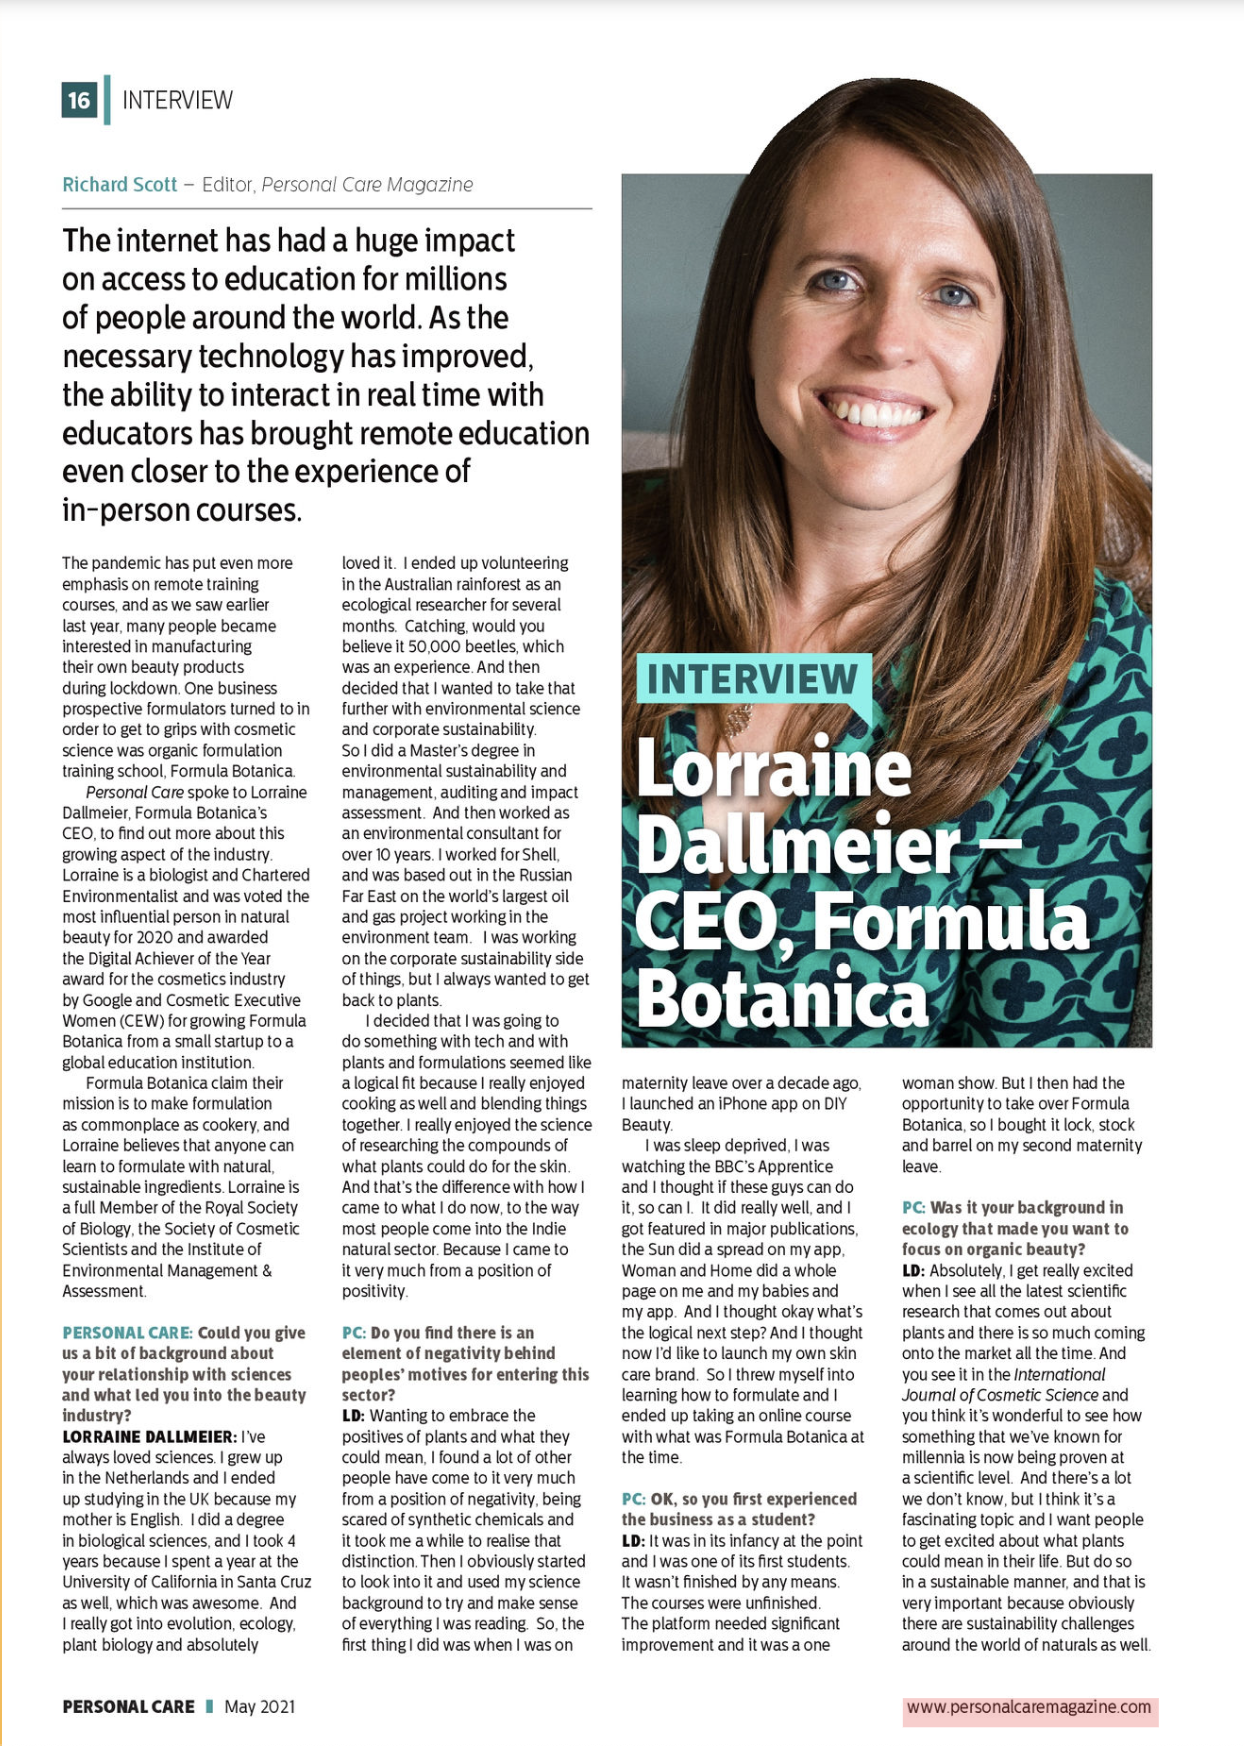 Personal Care Global - Lorraine Dallmeier Interview